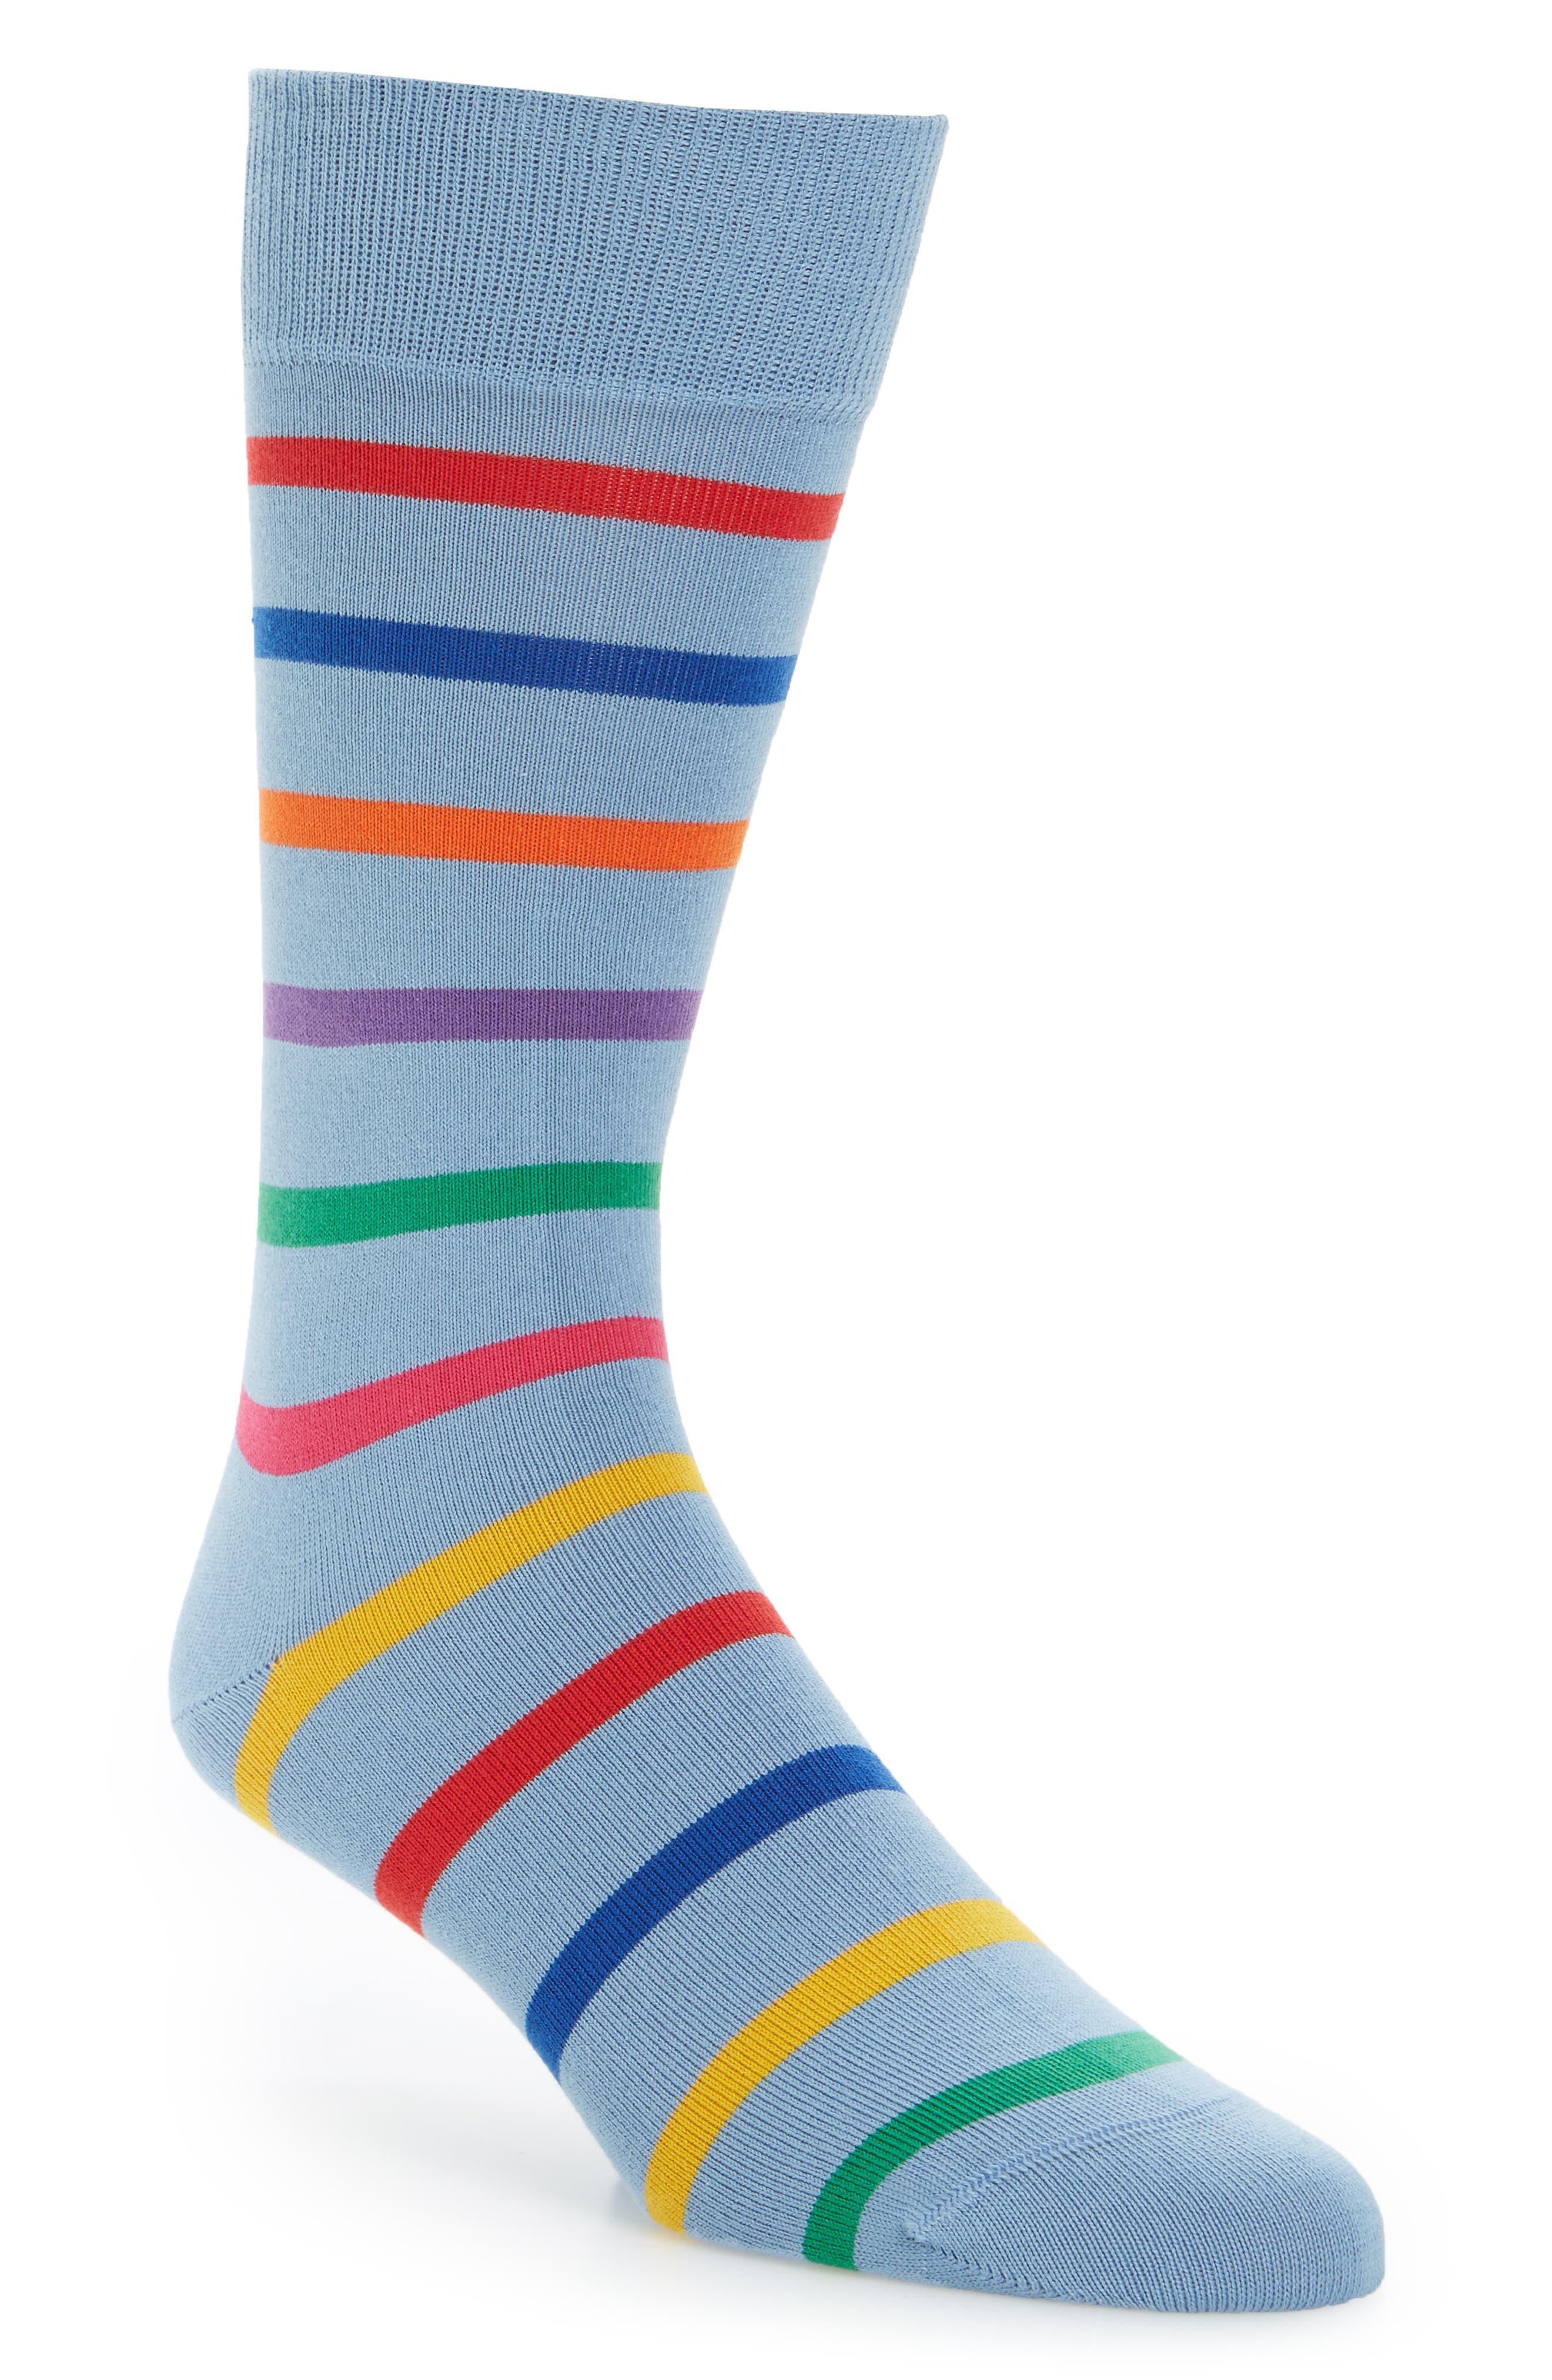 Paul Smith Bright Stripe Socks